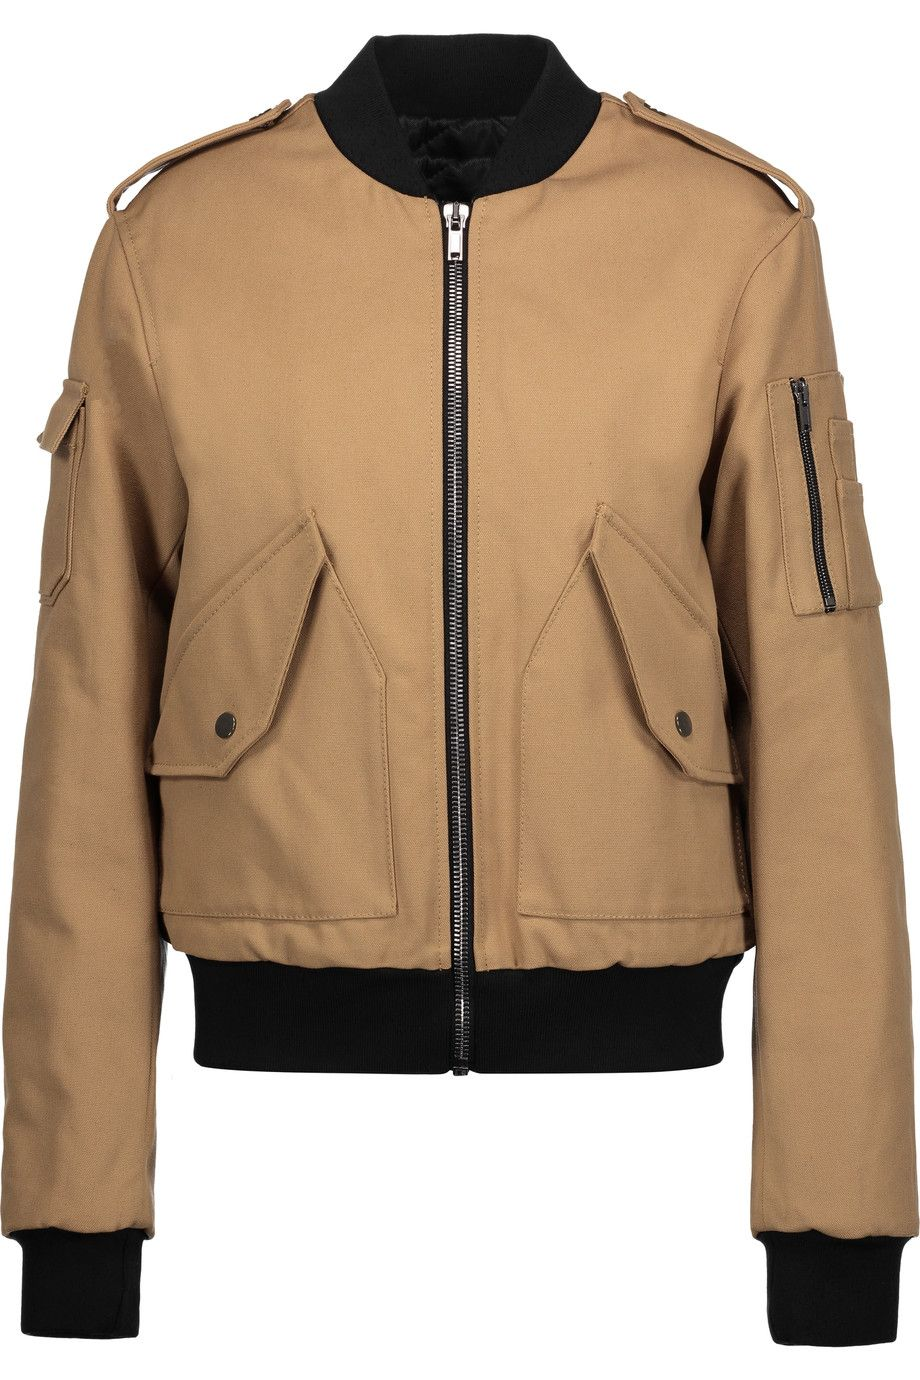 Msgm Cotton Canvas Bomber Jacket Msgm Cloth Jacket Bomber Jacket Jackets Clothes Design [ 1380 x 920 Pixel ]